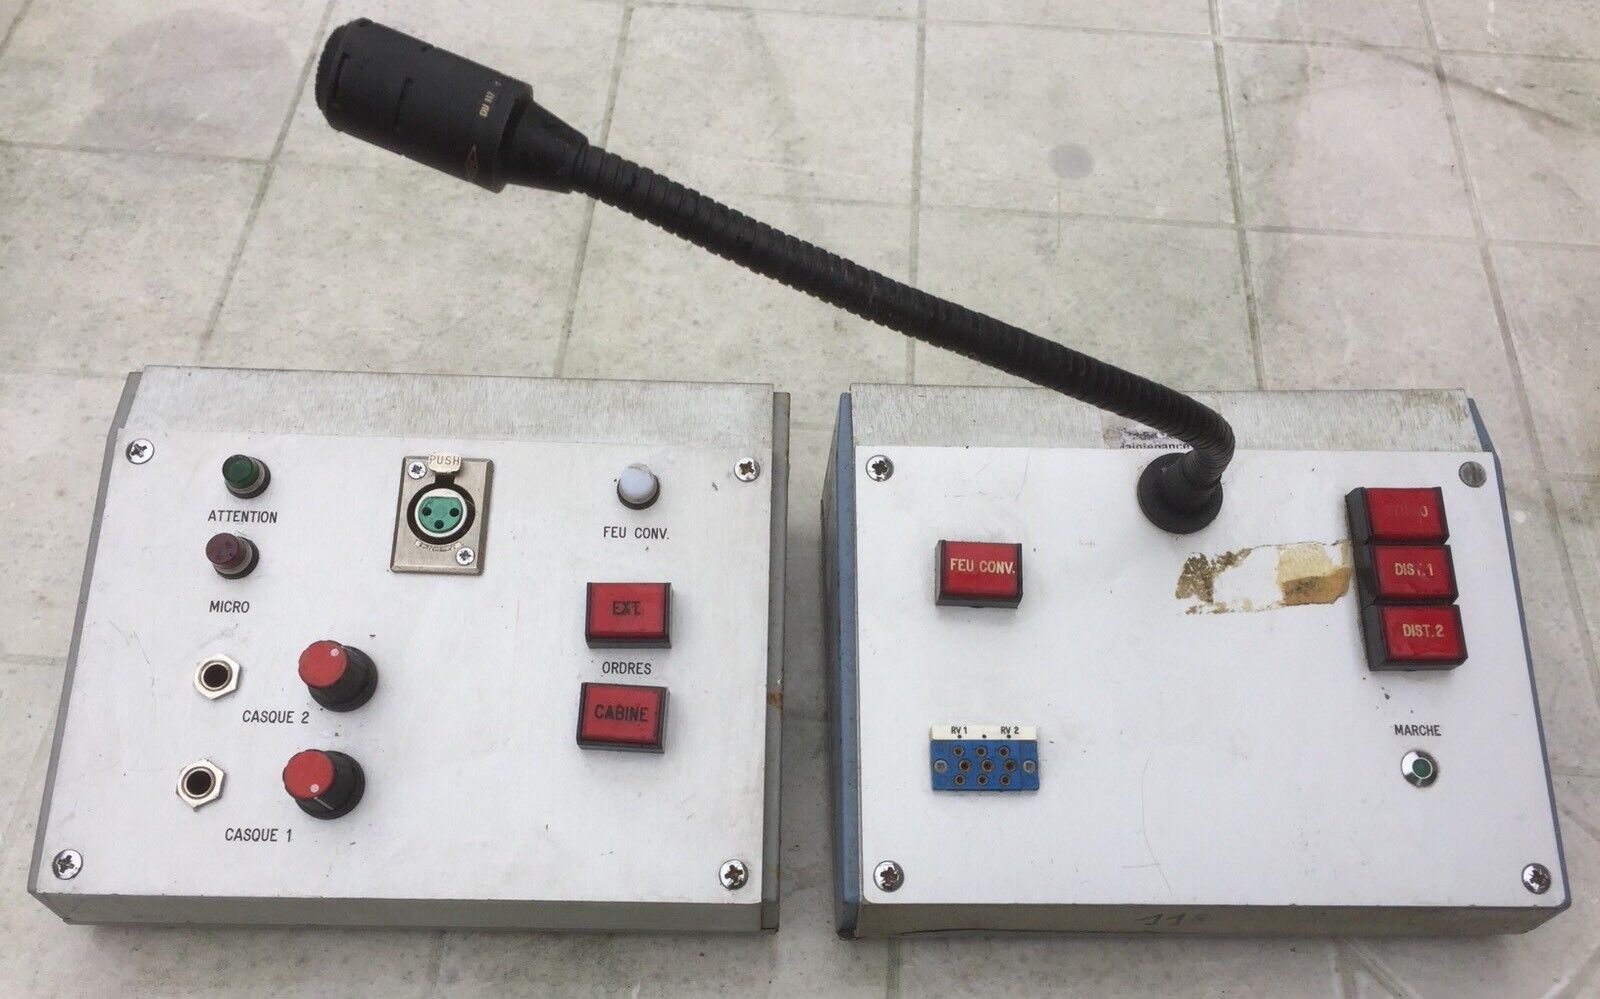 2 Boîtiers Intercom Radio Vintage Avec Micro